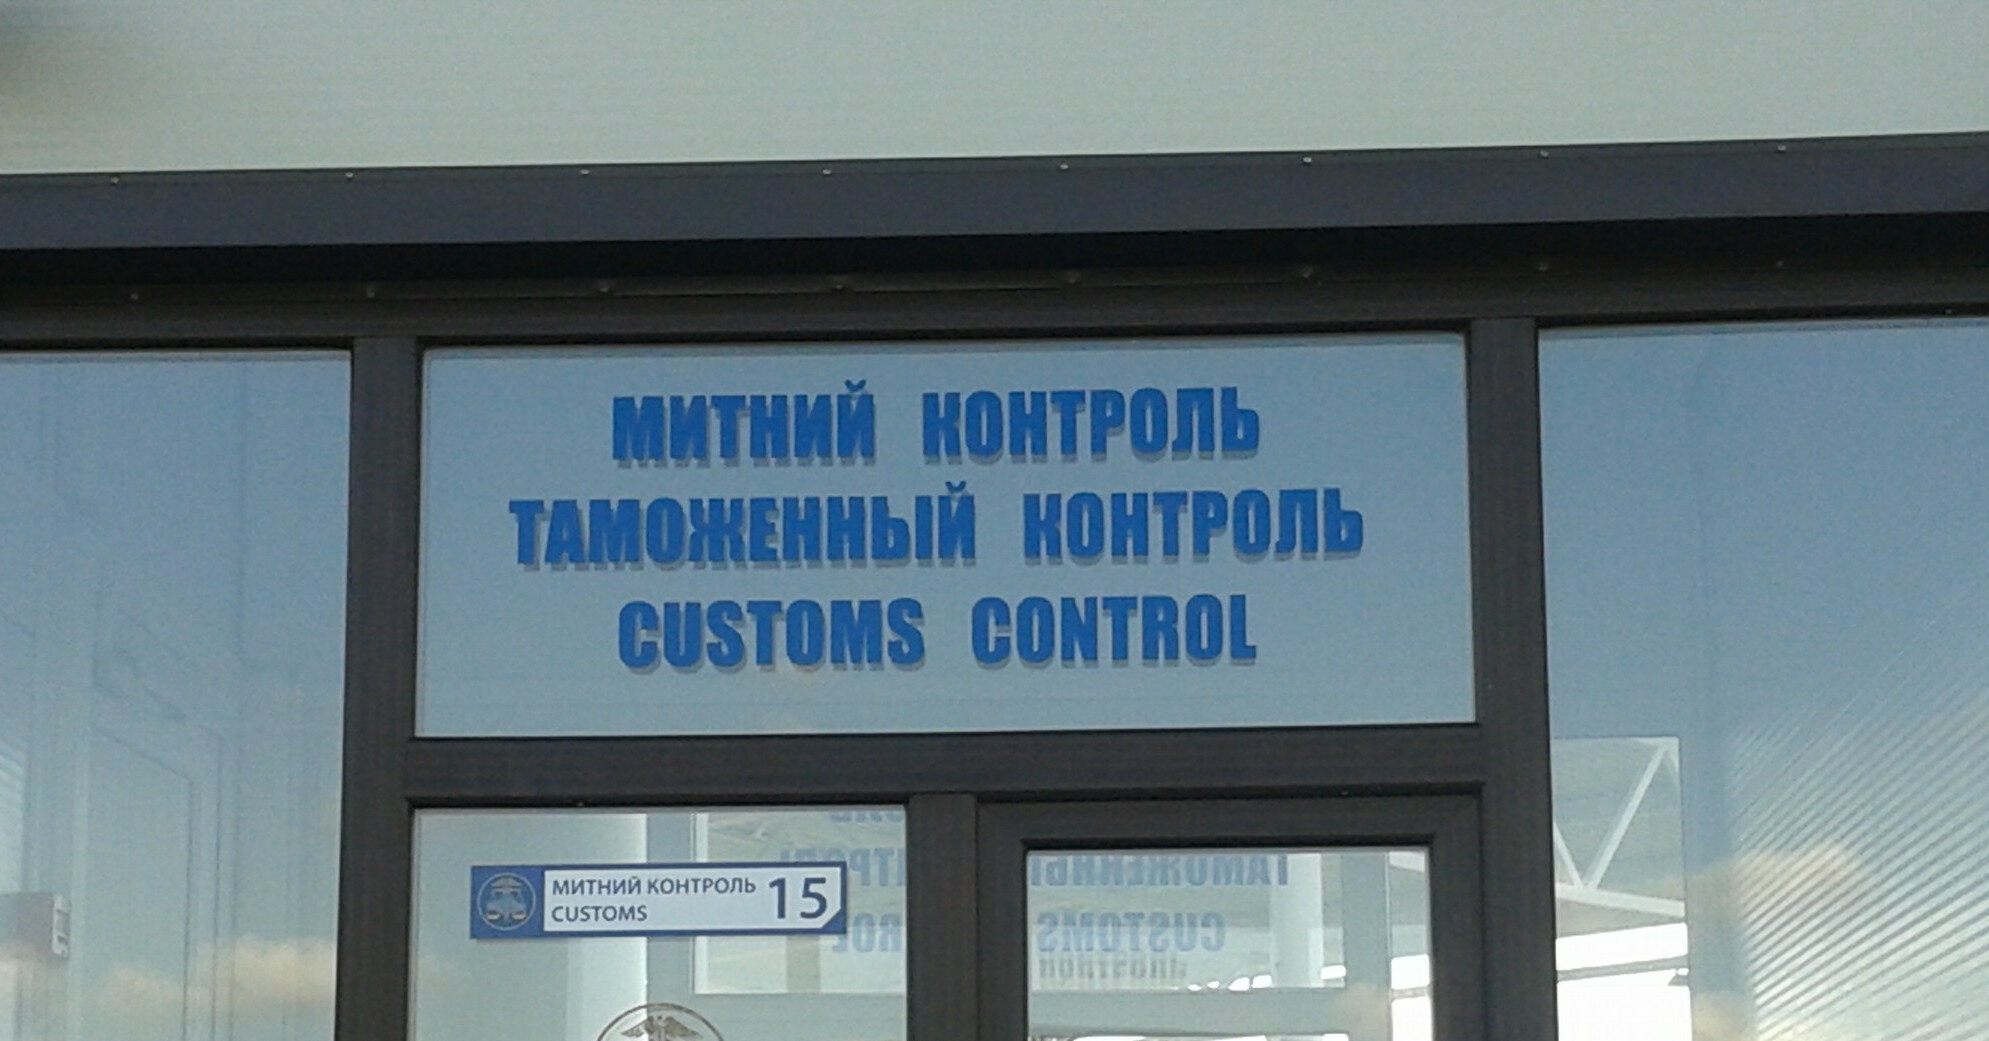 Таможенники пресекли контрабанды и нарушений на 1,5 млрд грн